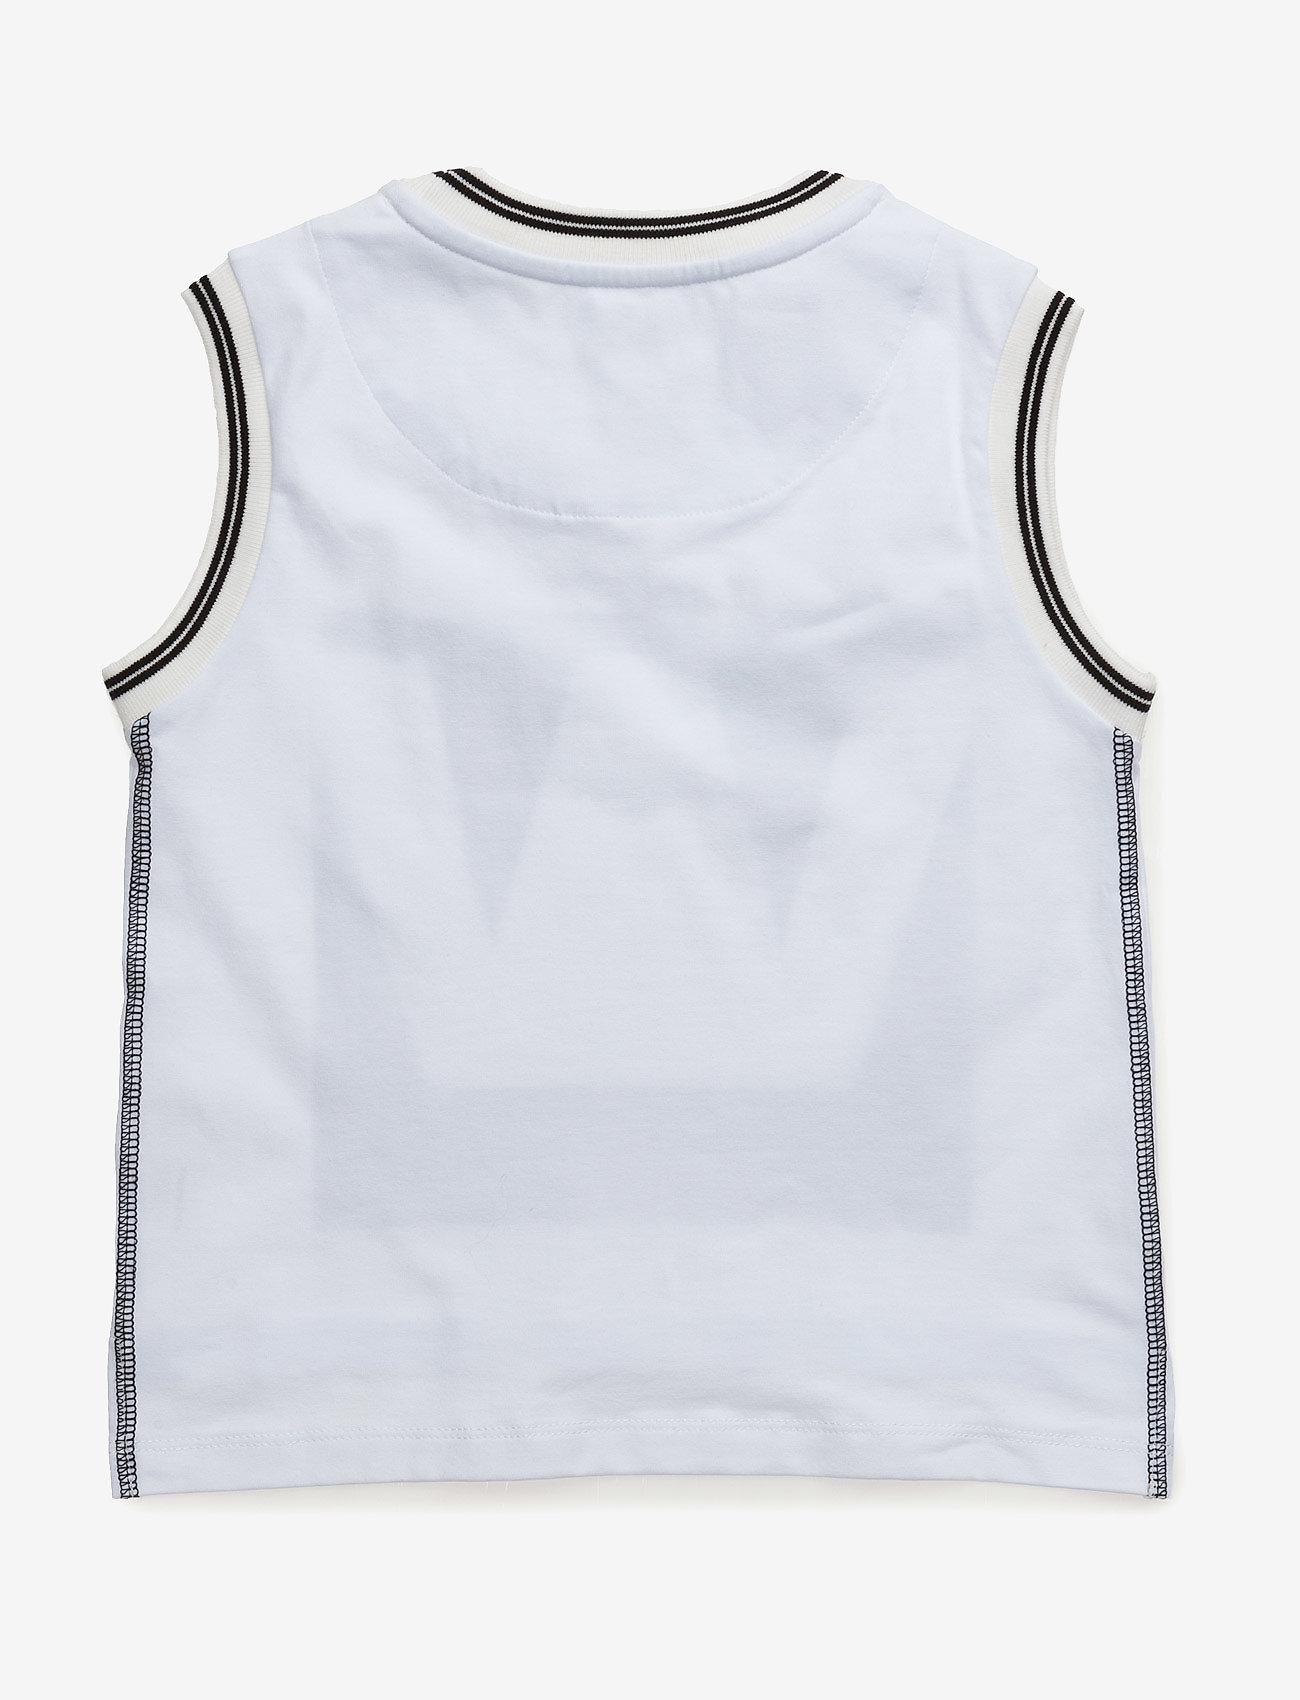 Hust & Claire - T-shirt - bez piedurknēm - white - 1